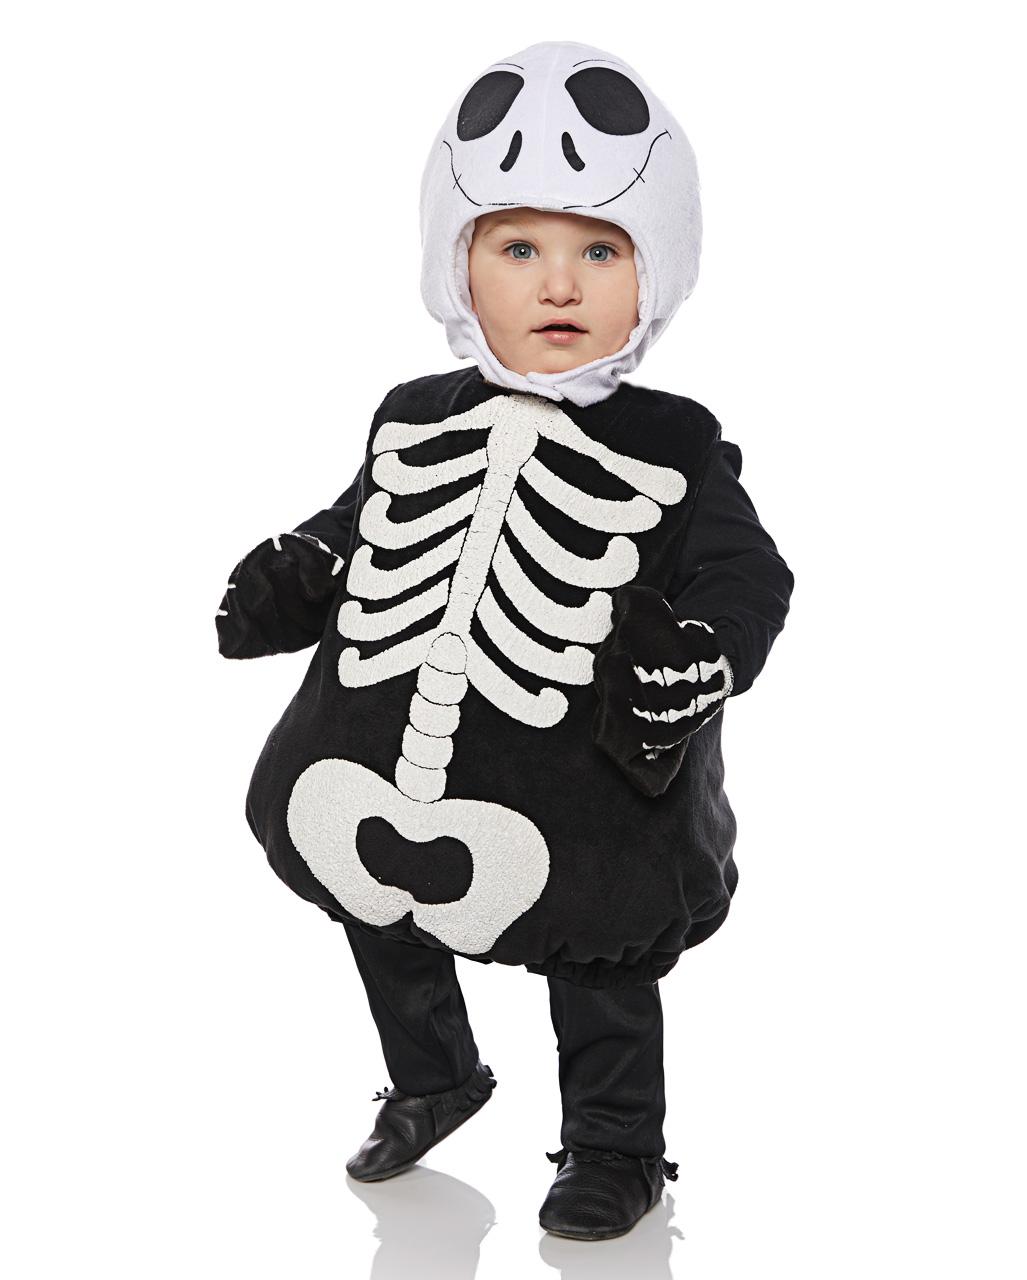 kleinkinderkost m skelett halloween kost m karneval universe. Black Bedroom Furniture Sets. Home Design Ideas